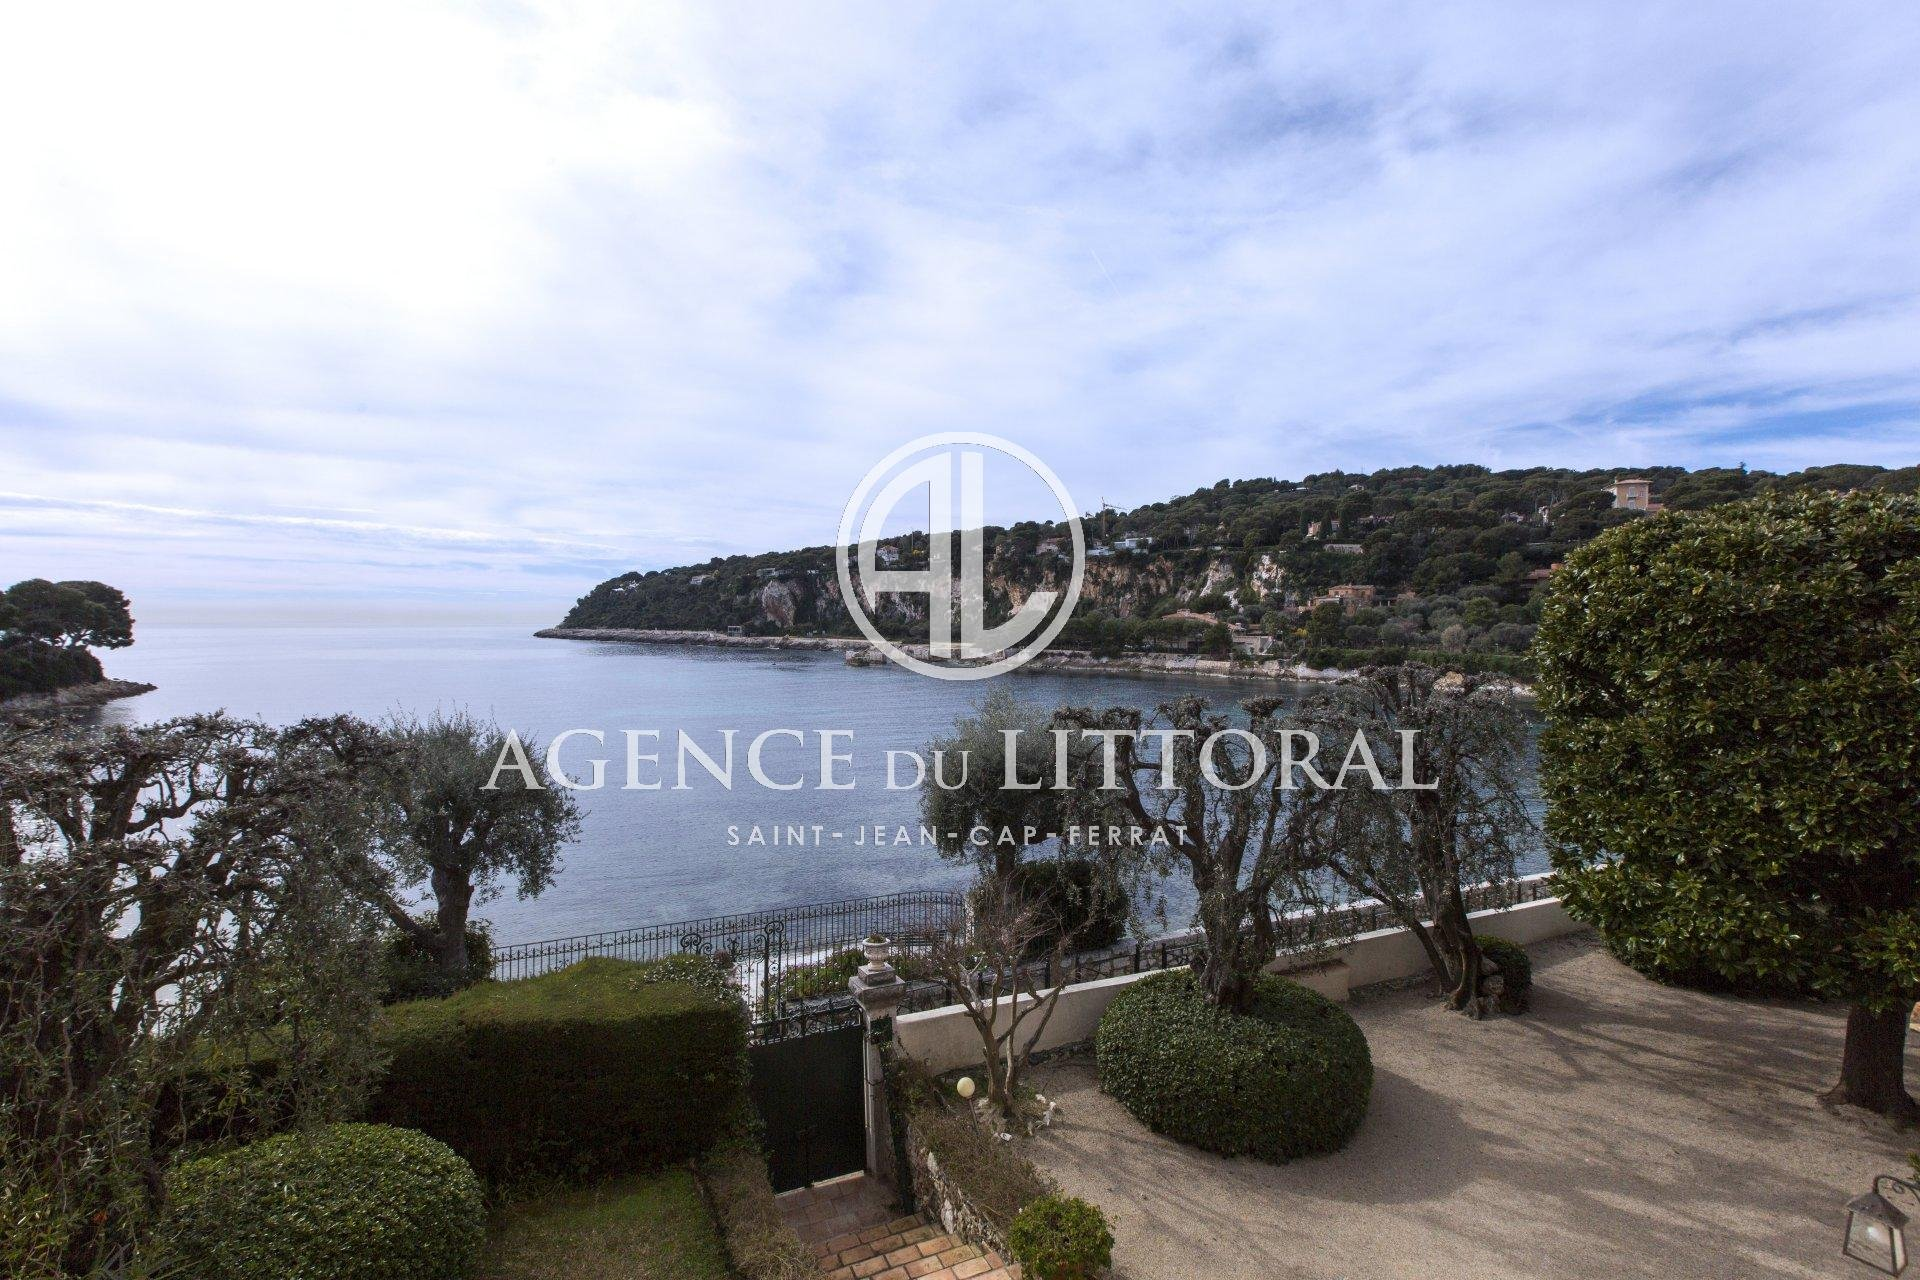 Villa Saint-Jean-Cap-Ferrat